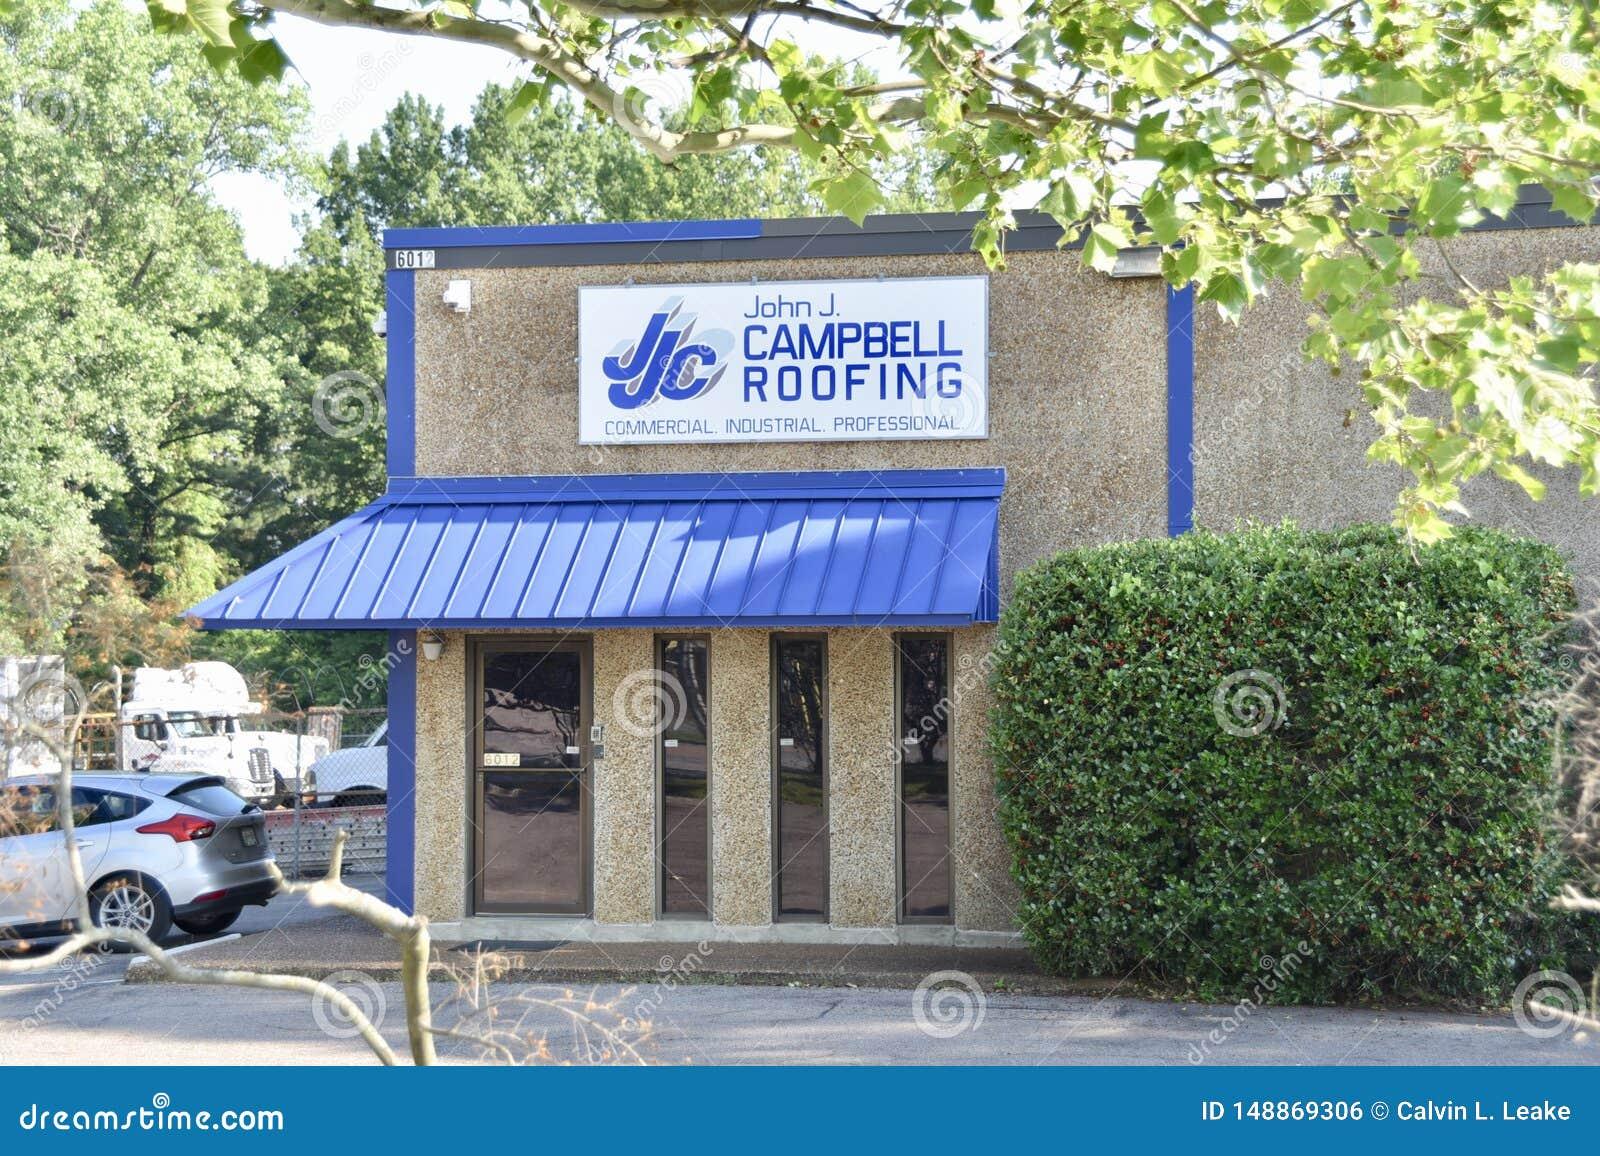 John J Campbell Roofing, Memphis, TN